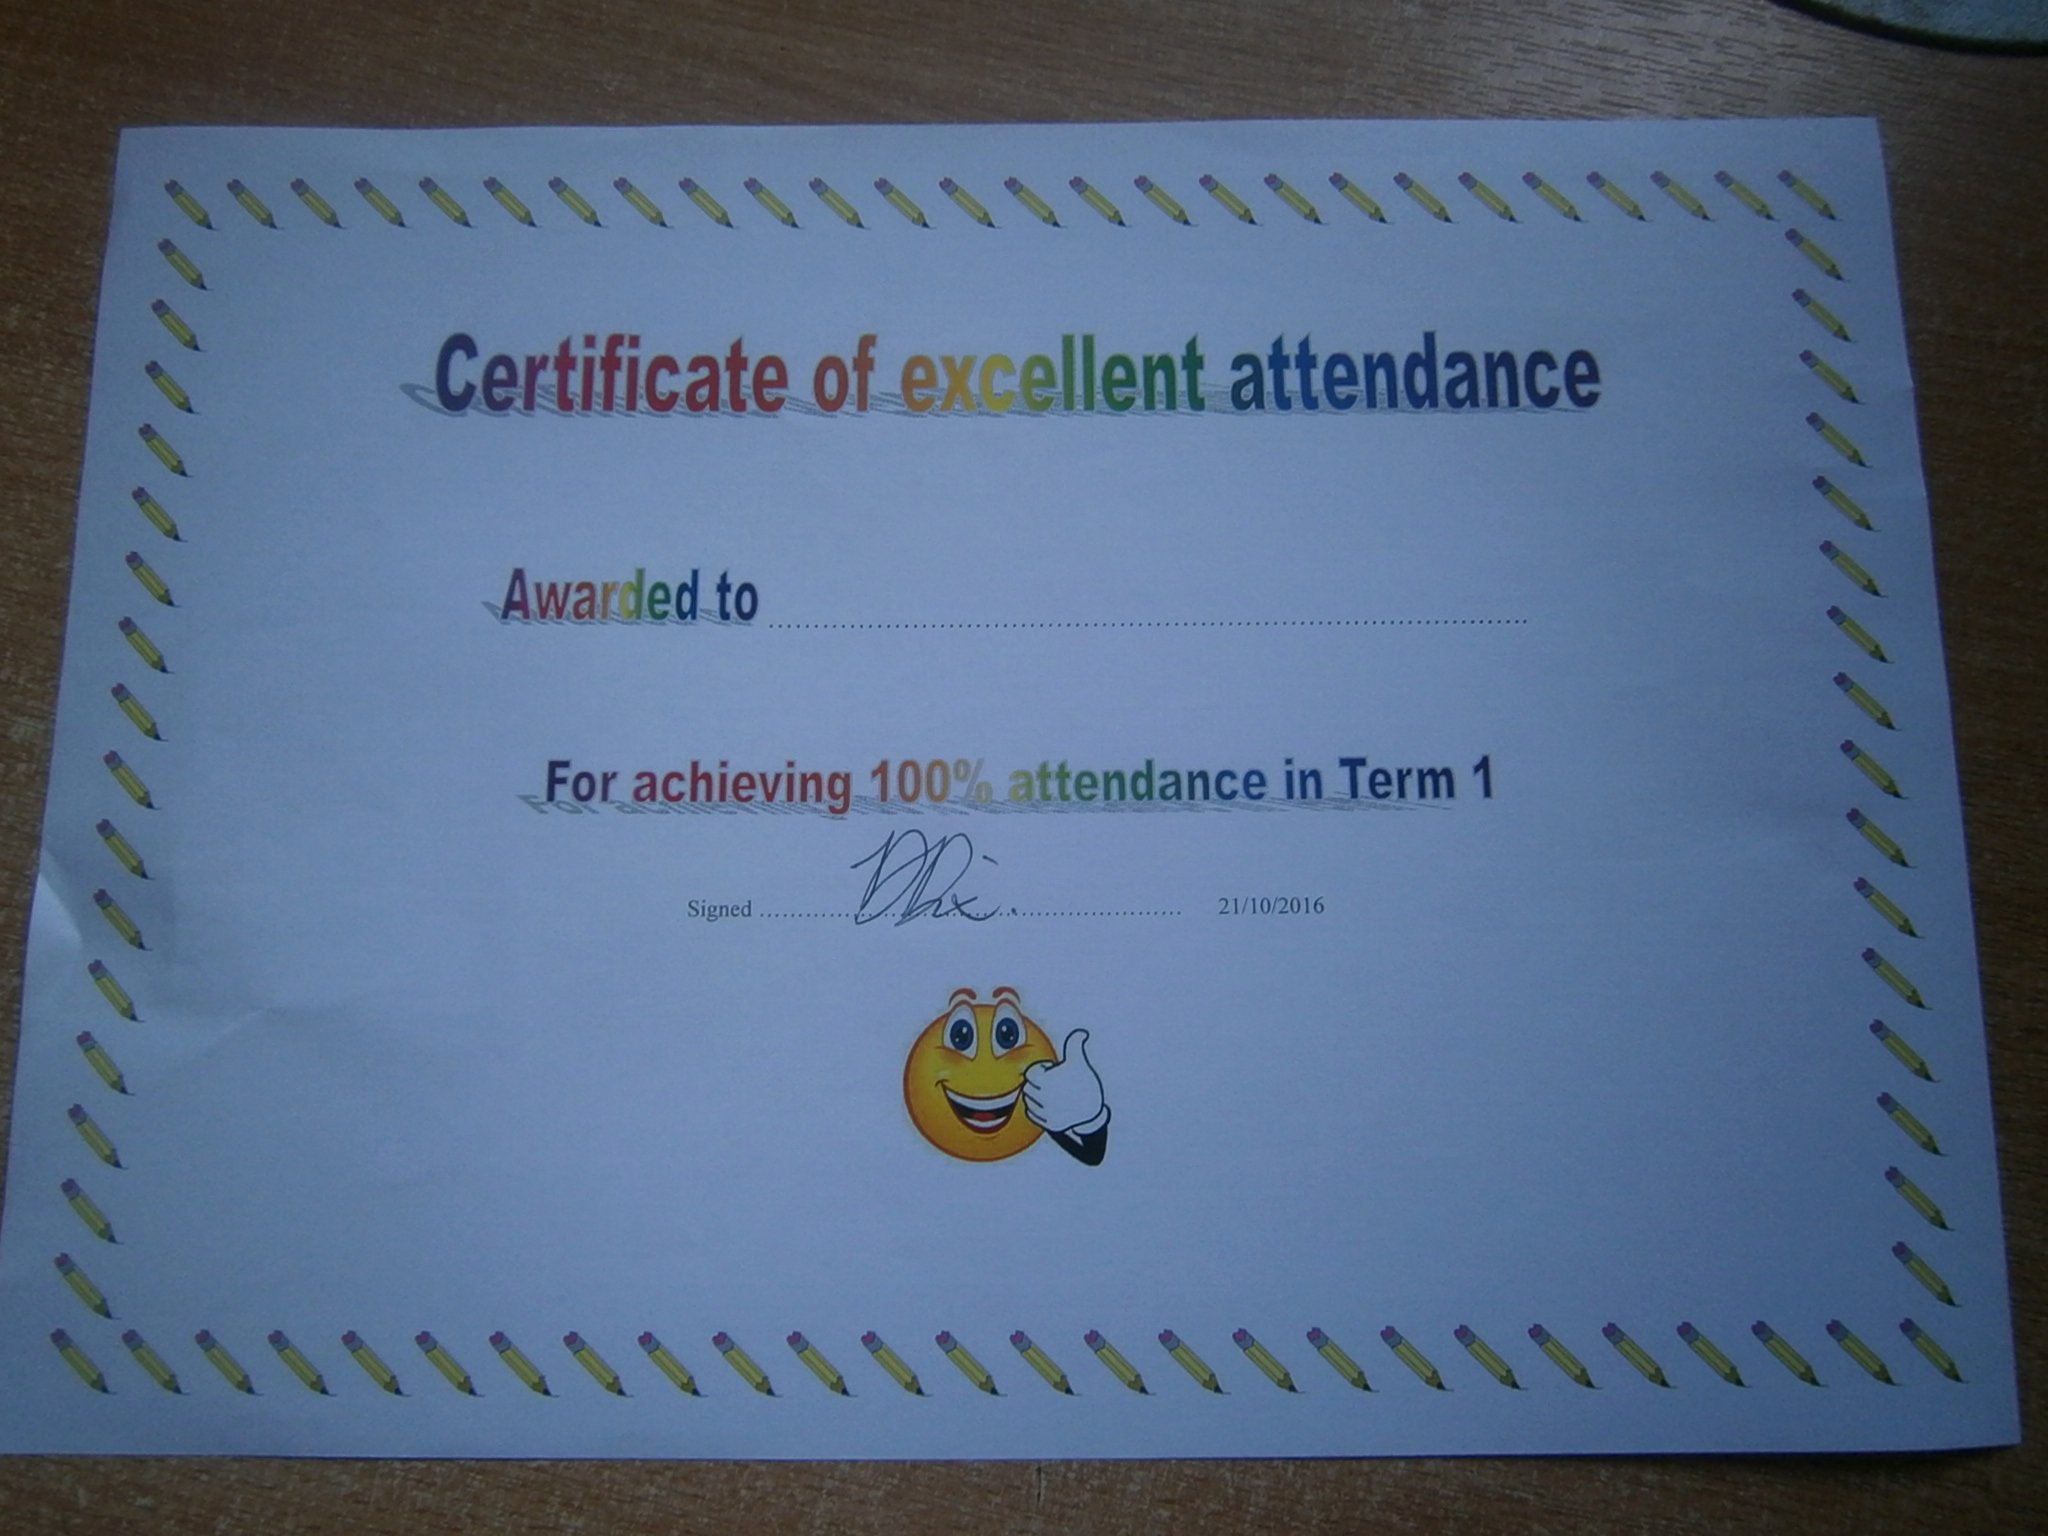 Uniform Certificate Of attendance New attendance What S Up at Oldbury School